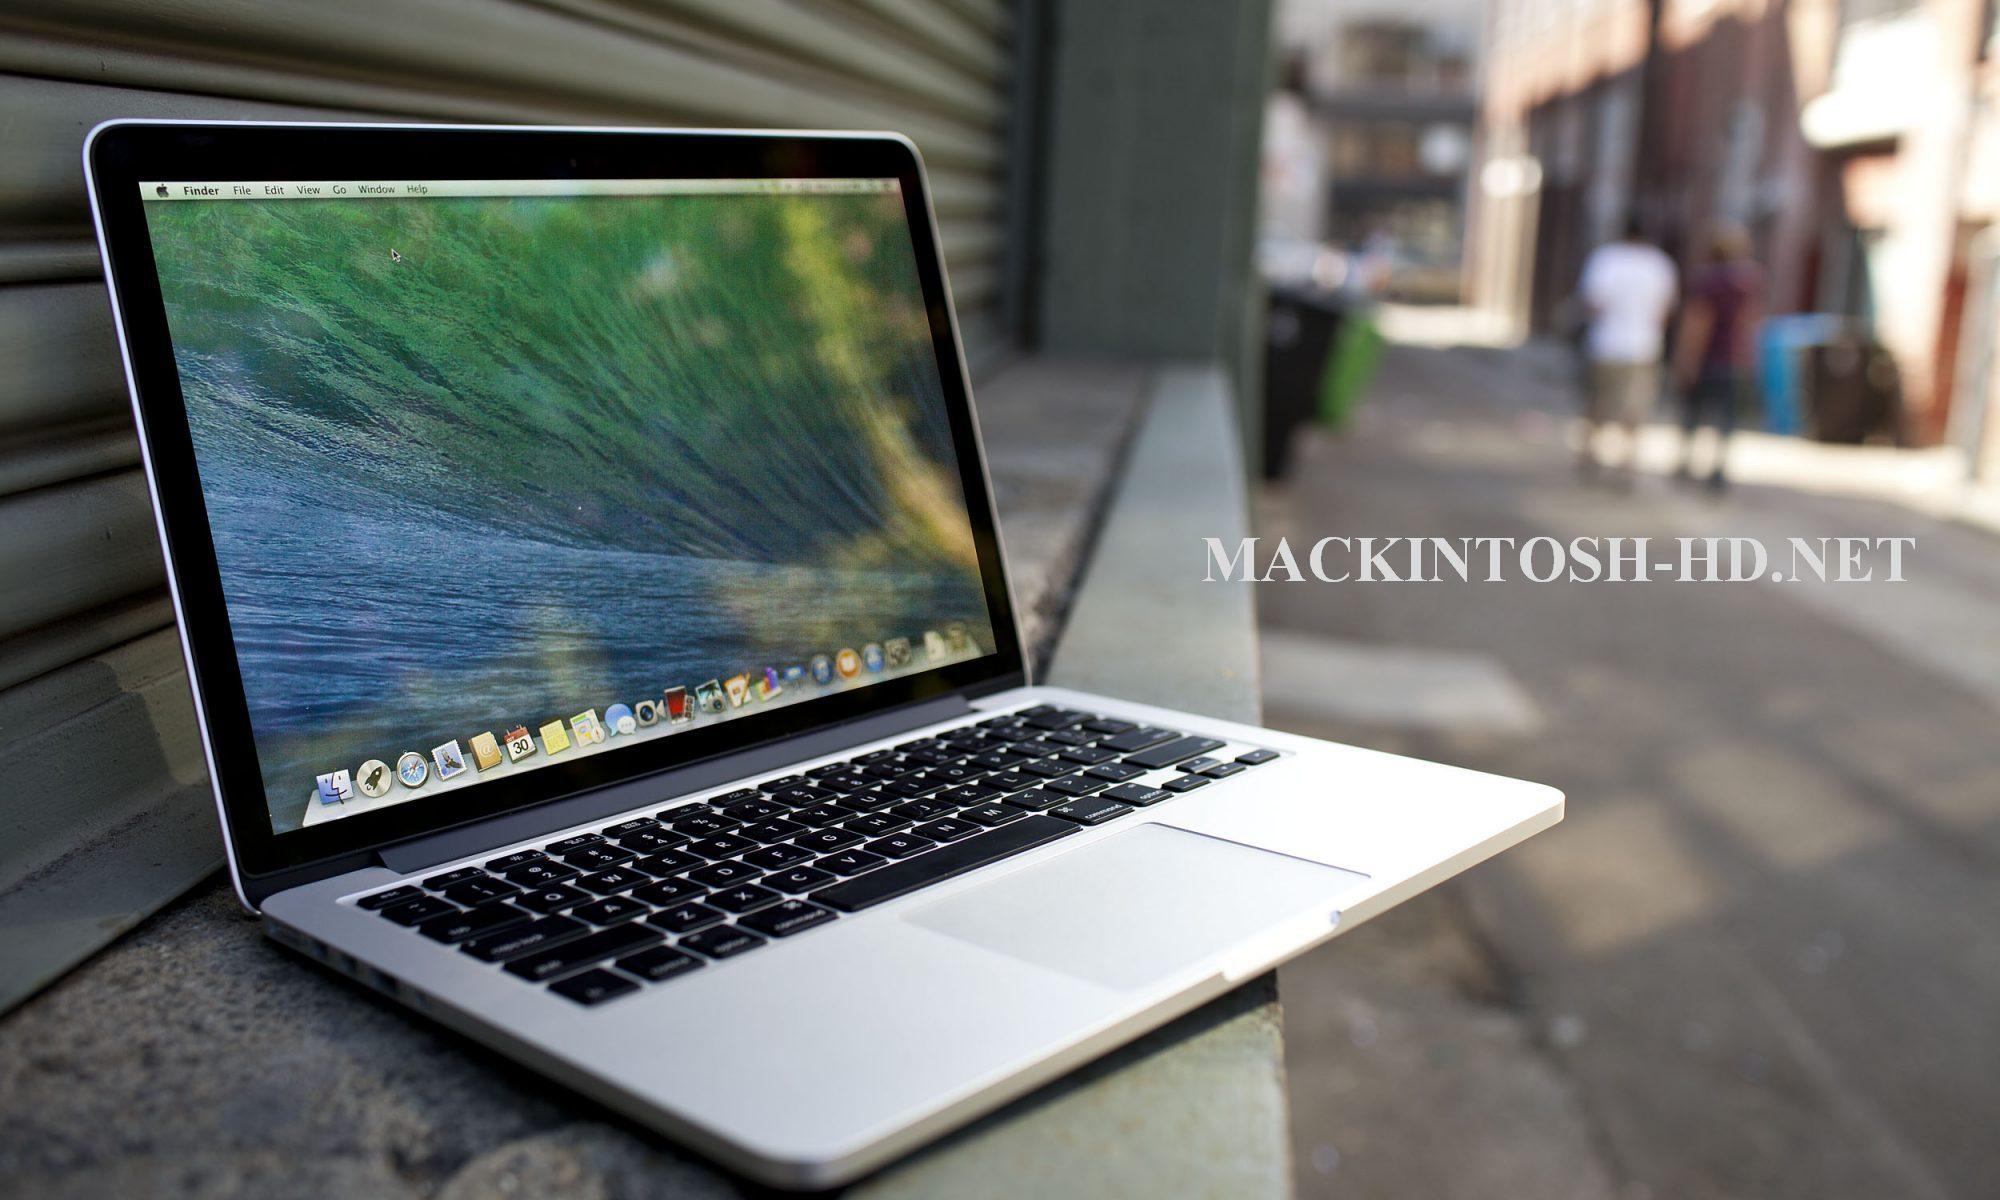 MACKINTOSH-HD